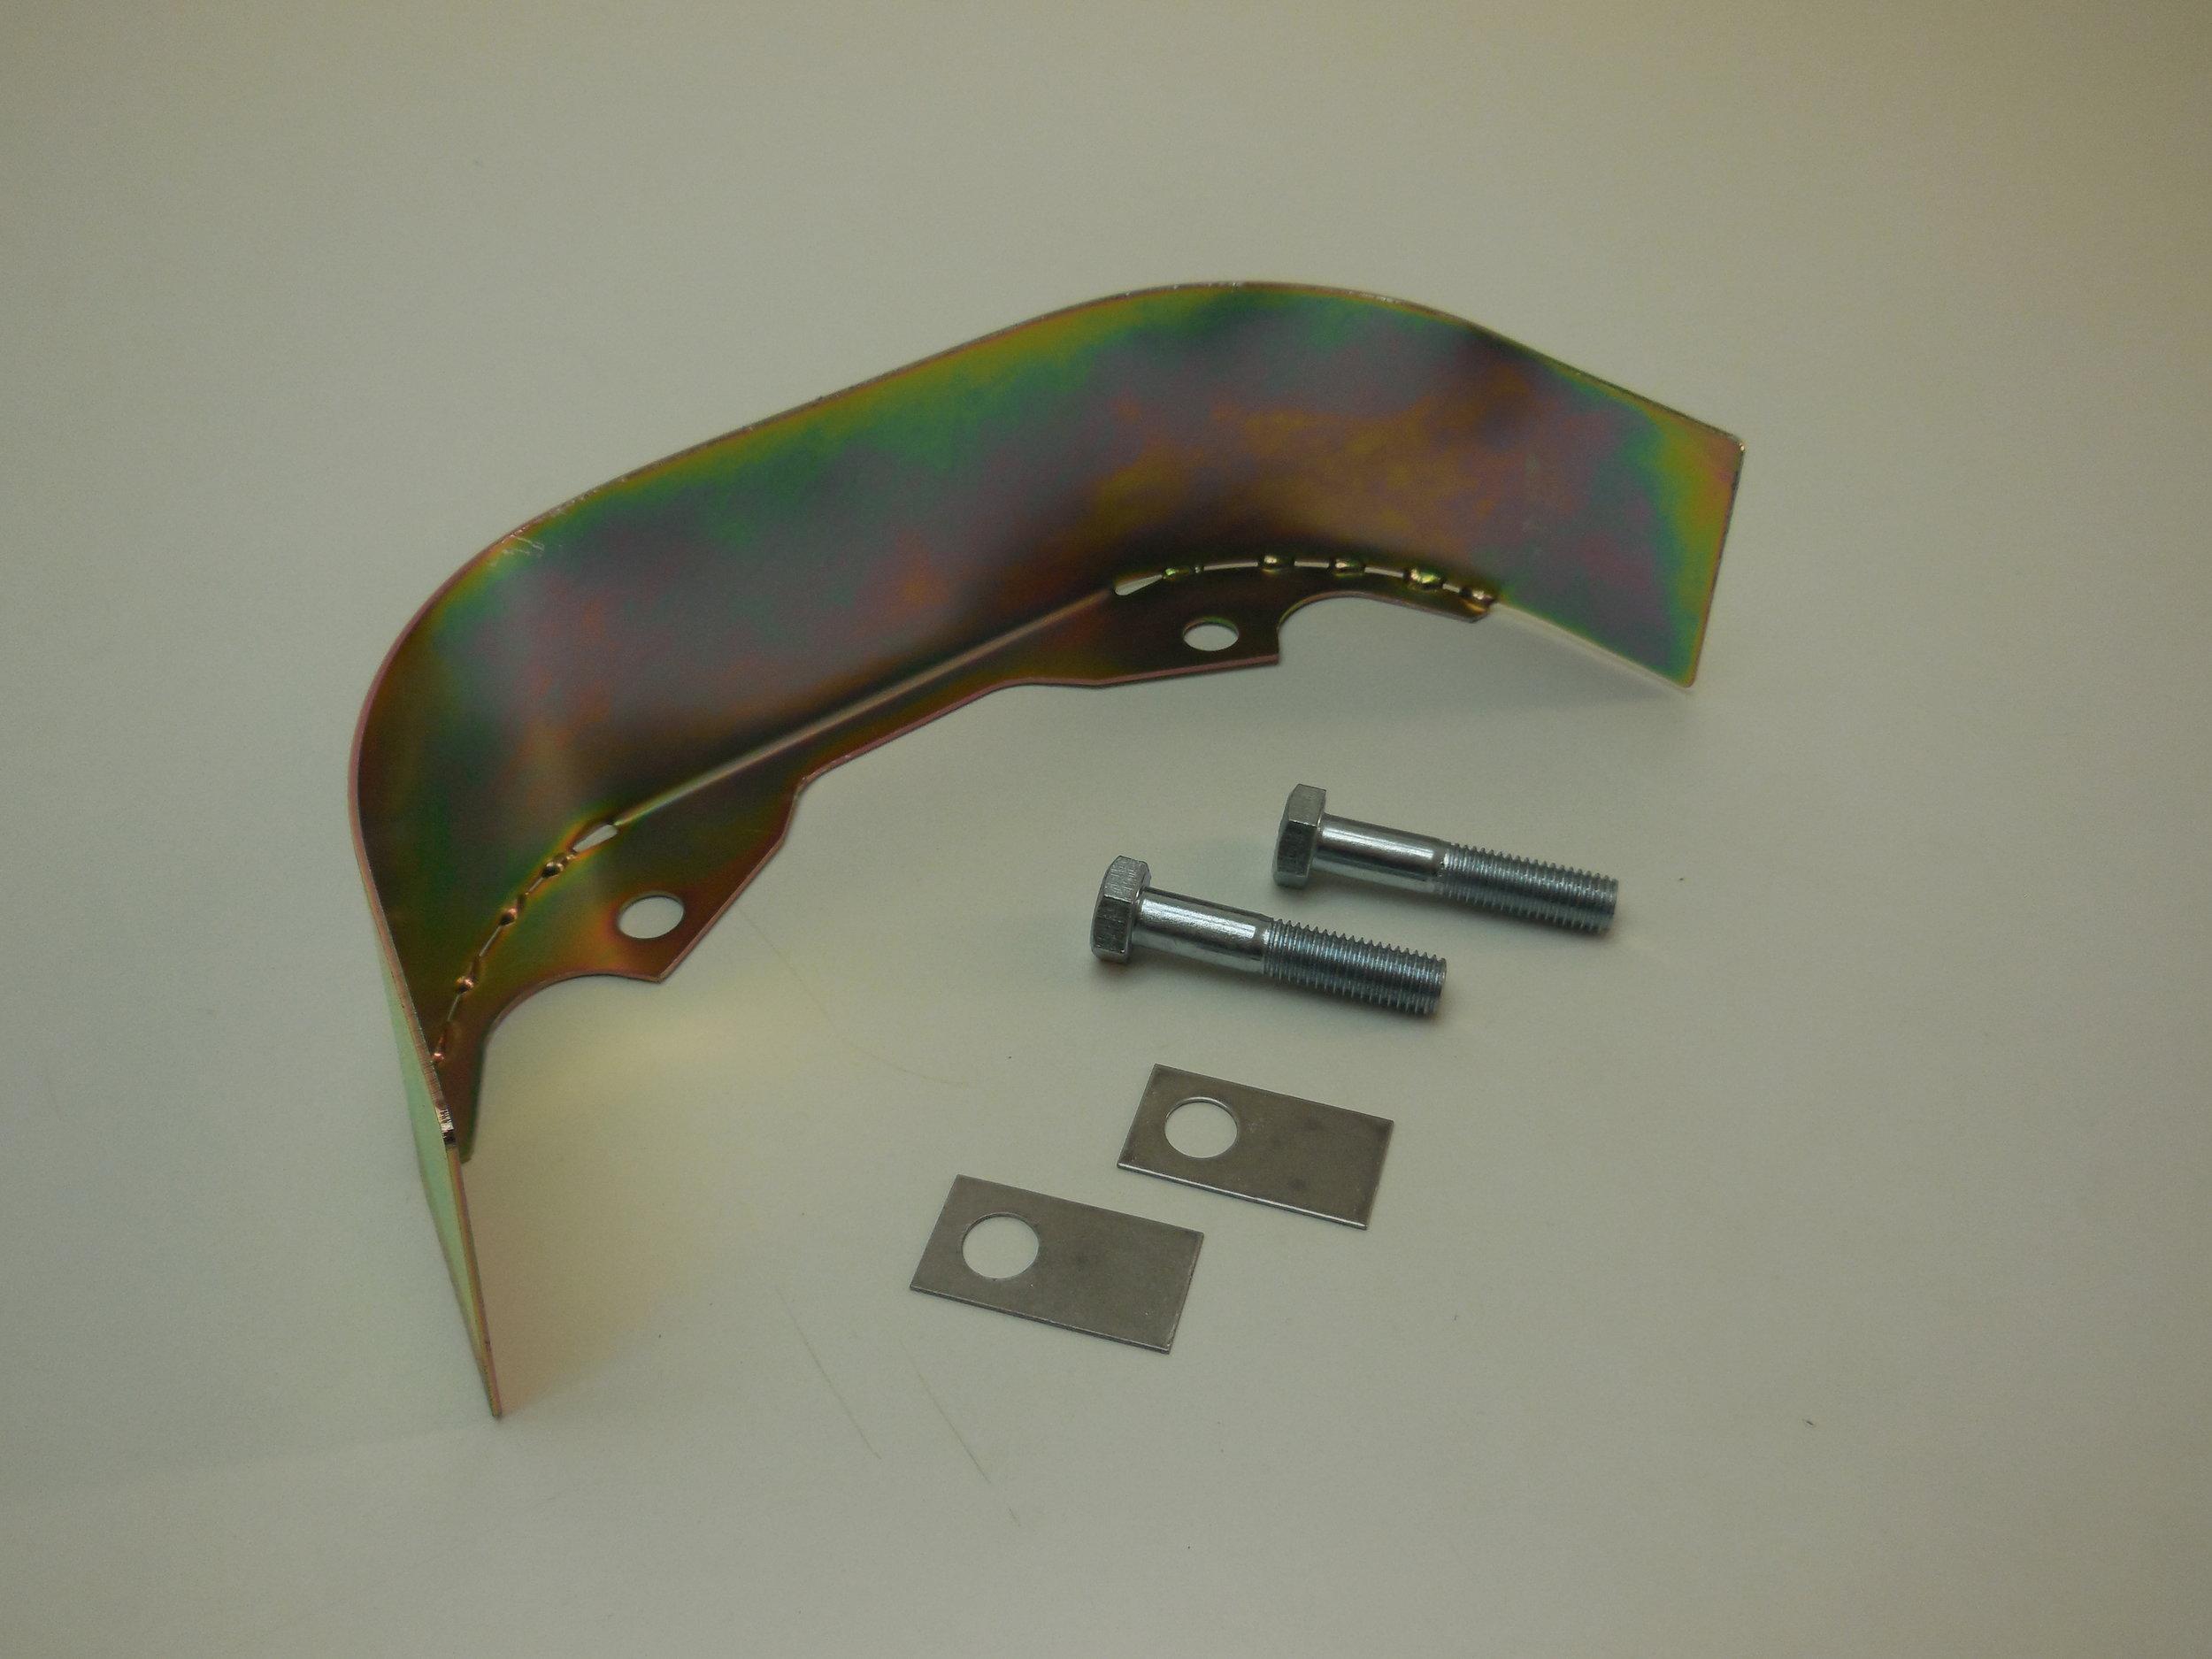 Sparke Protection Breaking Unit Häggo Nr: 20036-726 Price: